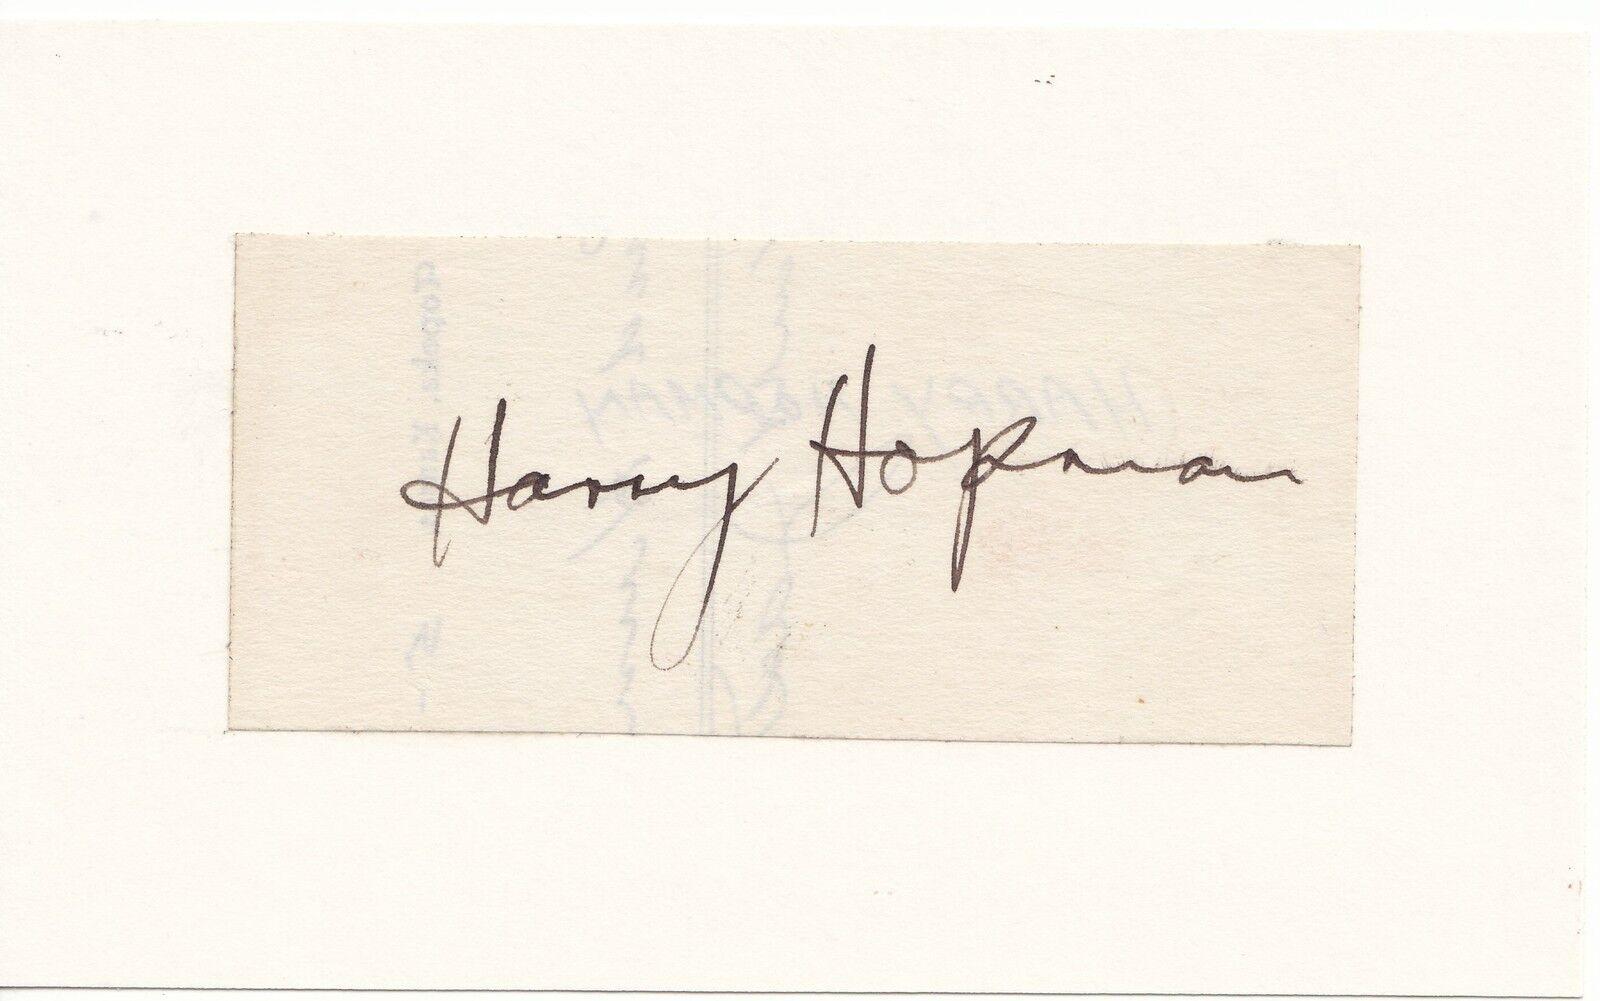 HARRY HOPMAN TENNIS AUSTRALIA DAVIS DAVIS DAVIS CUP VERY RARE SIGNATURE CUT COA 81a0ab